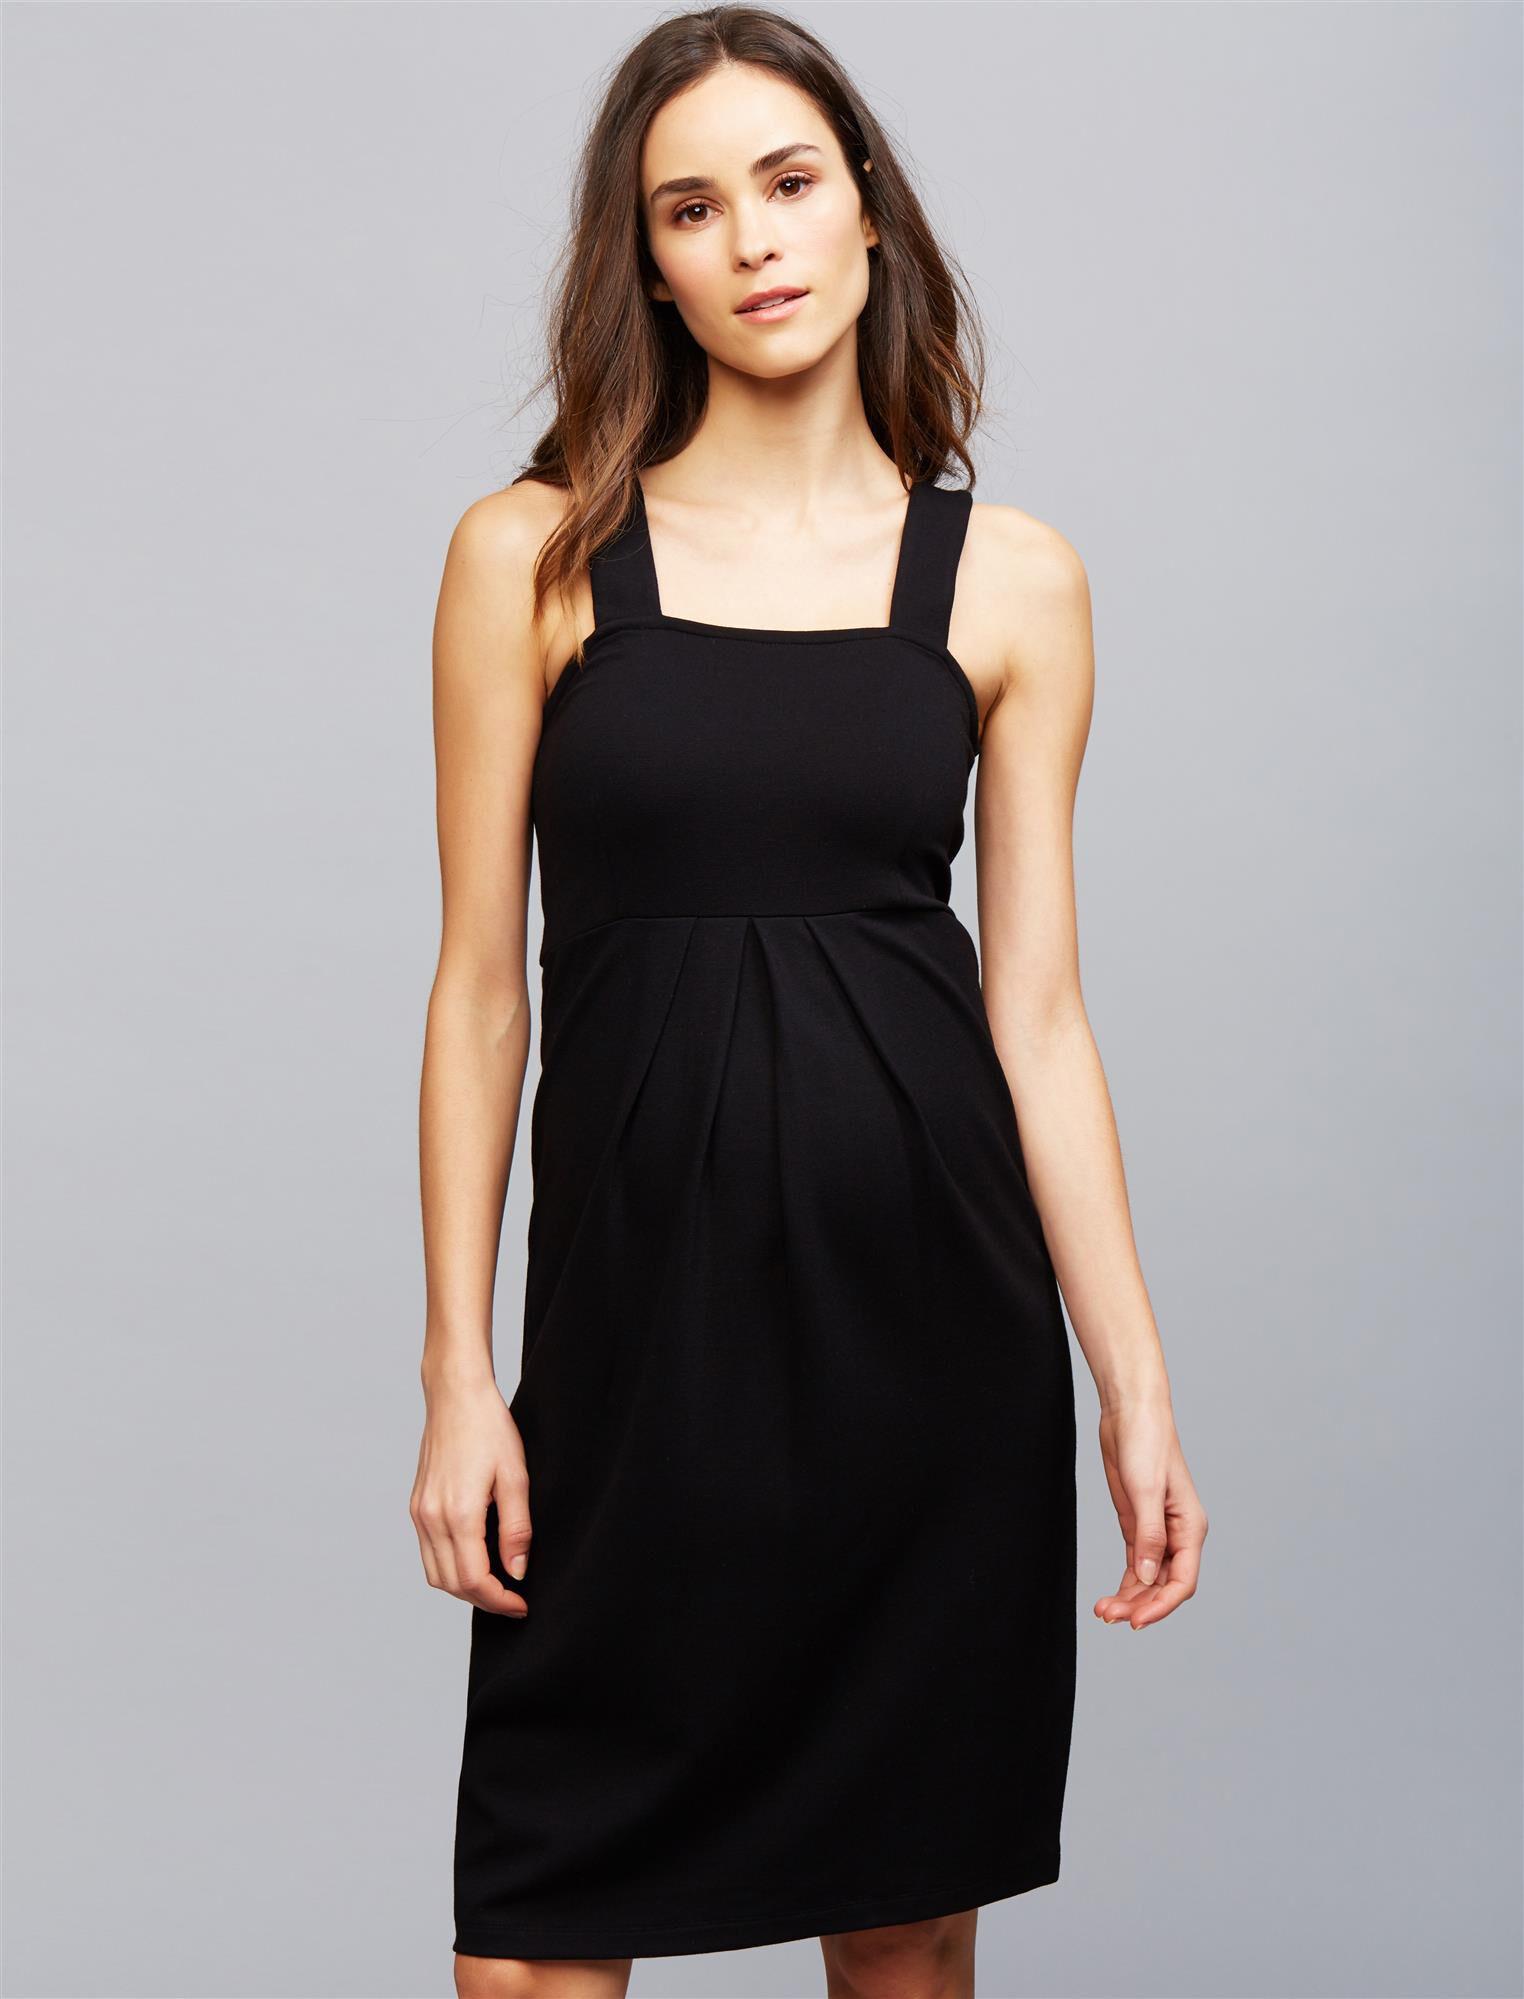 Isabella Oliver Shift Dress Maternity Dress